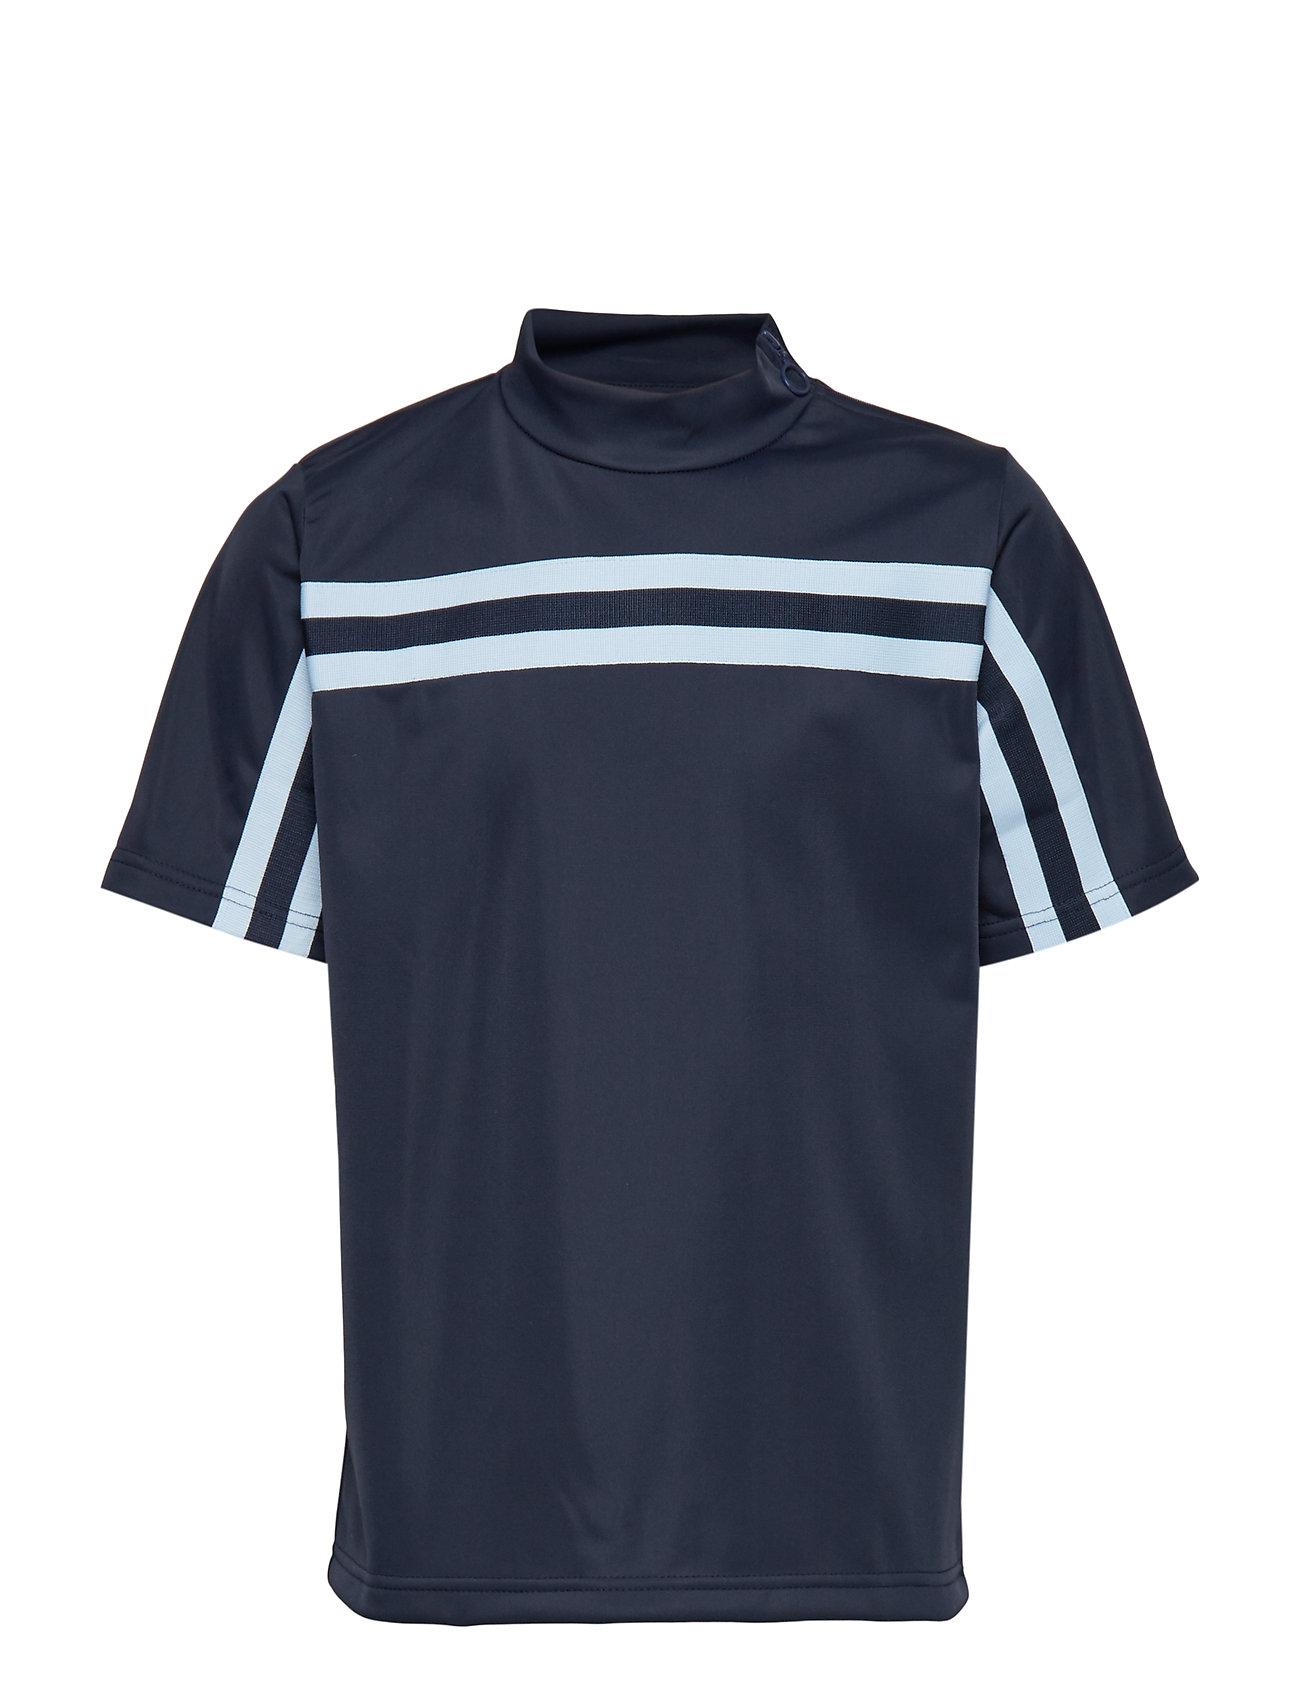 Unauthorized Franco T-shirt - BLUE NIGHTS